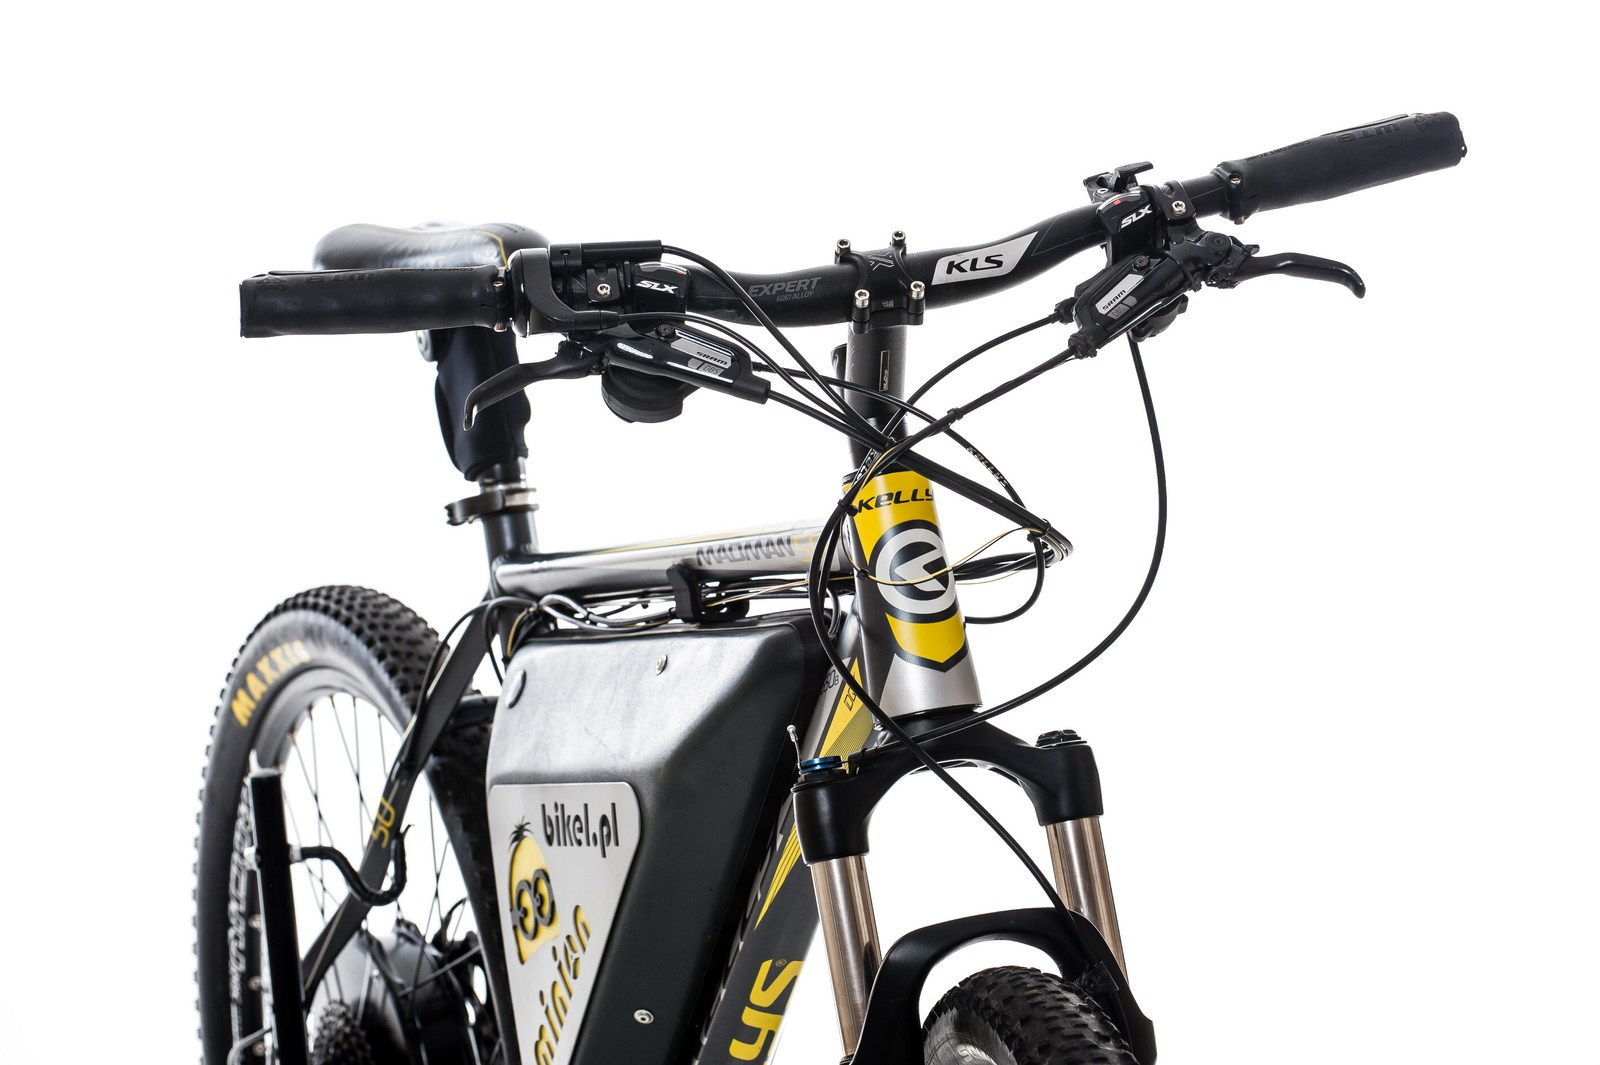 e-bike with MPe computer